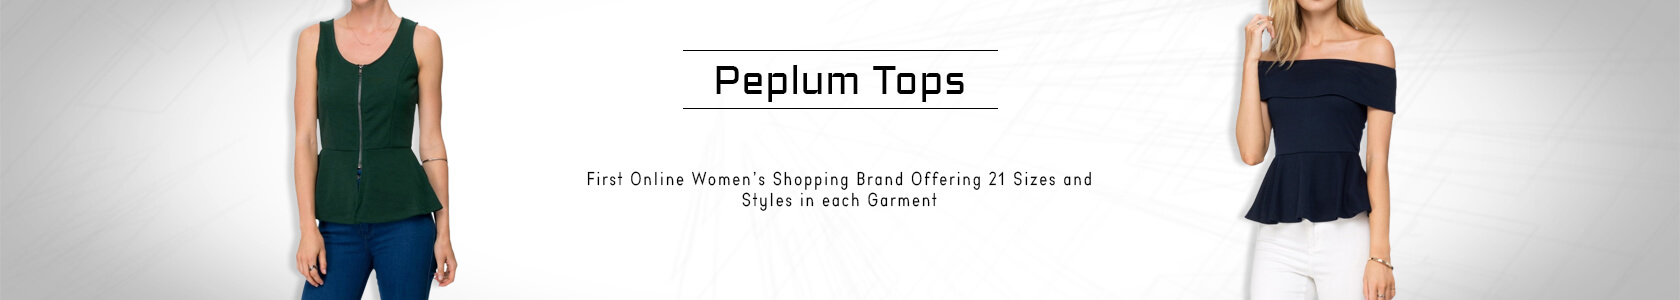 Peplum Tops